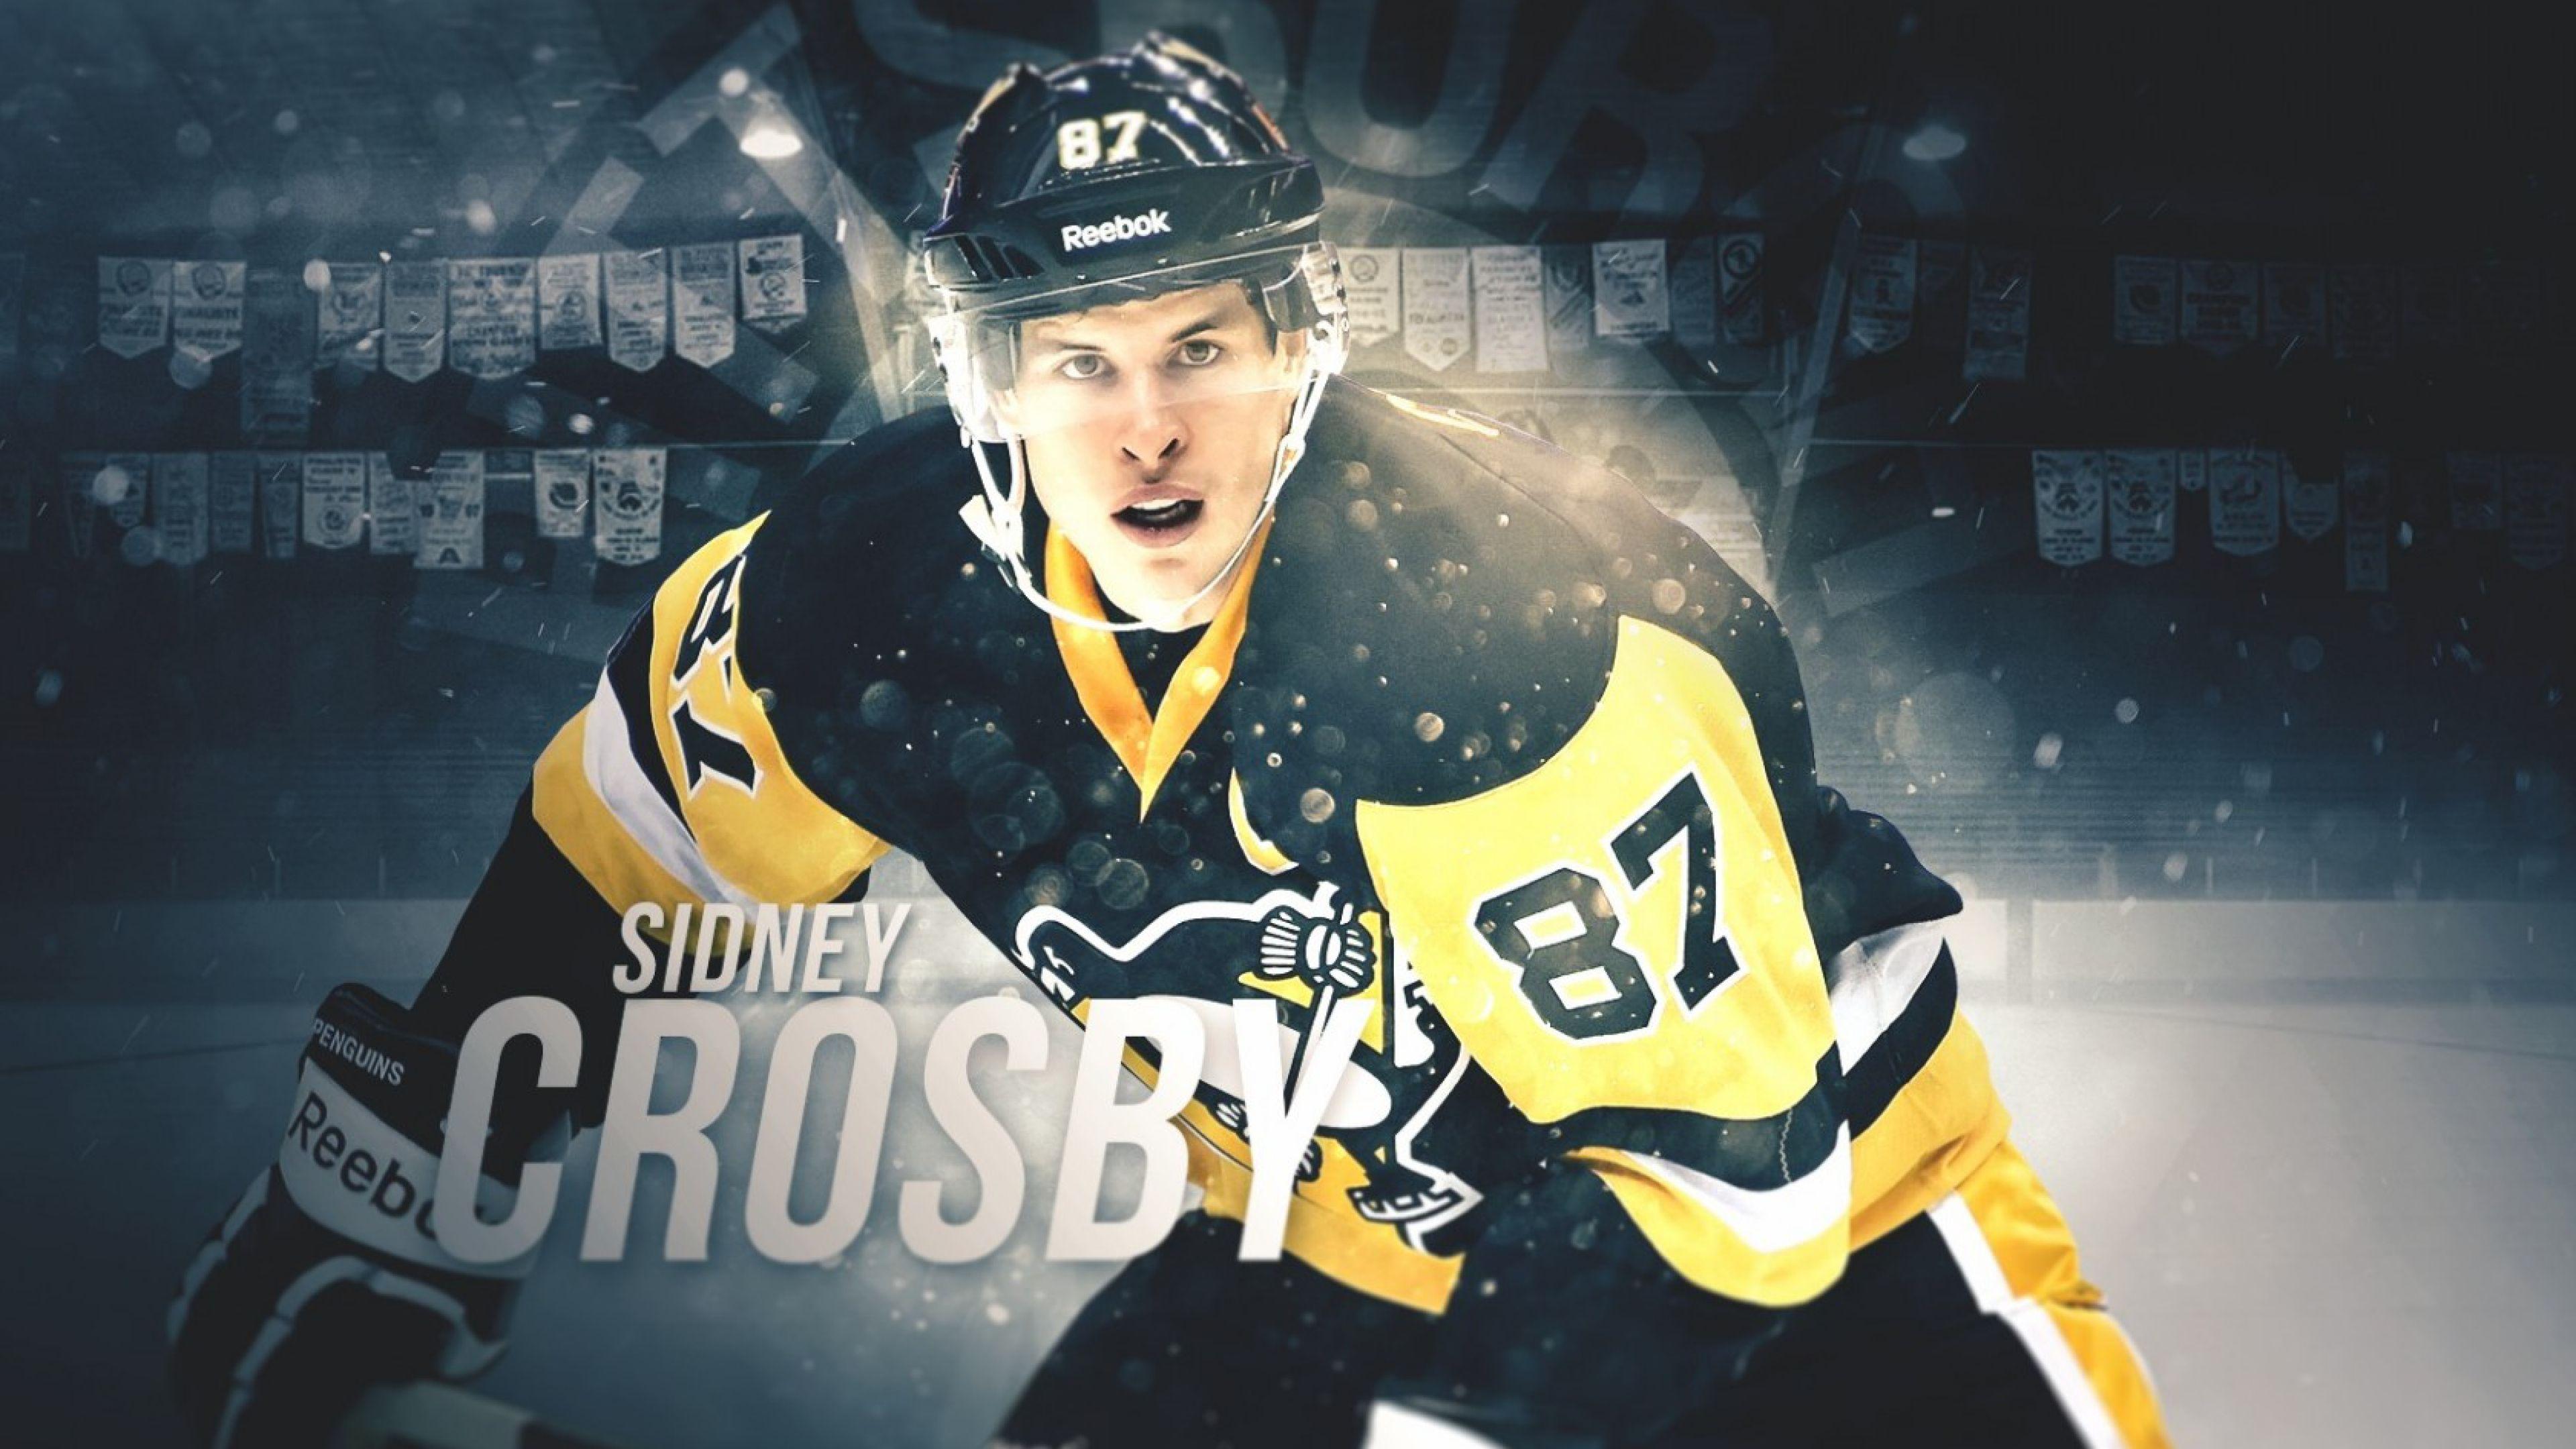 Sidney Crosby HD Wallpapers   7wallpapers.net